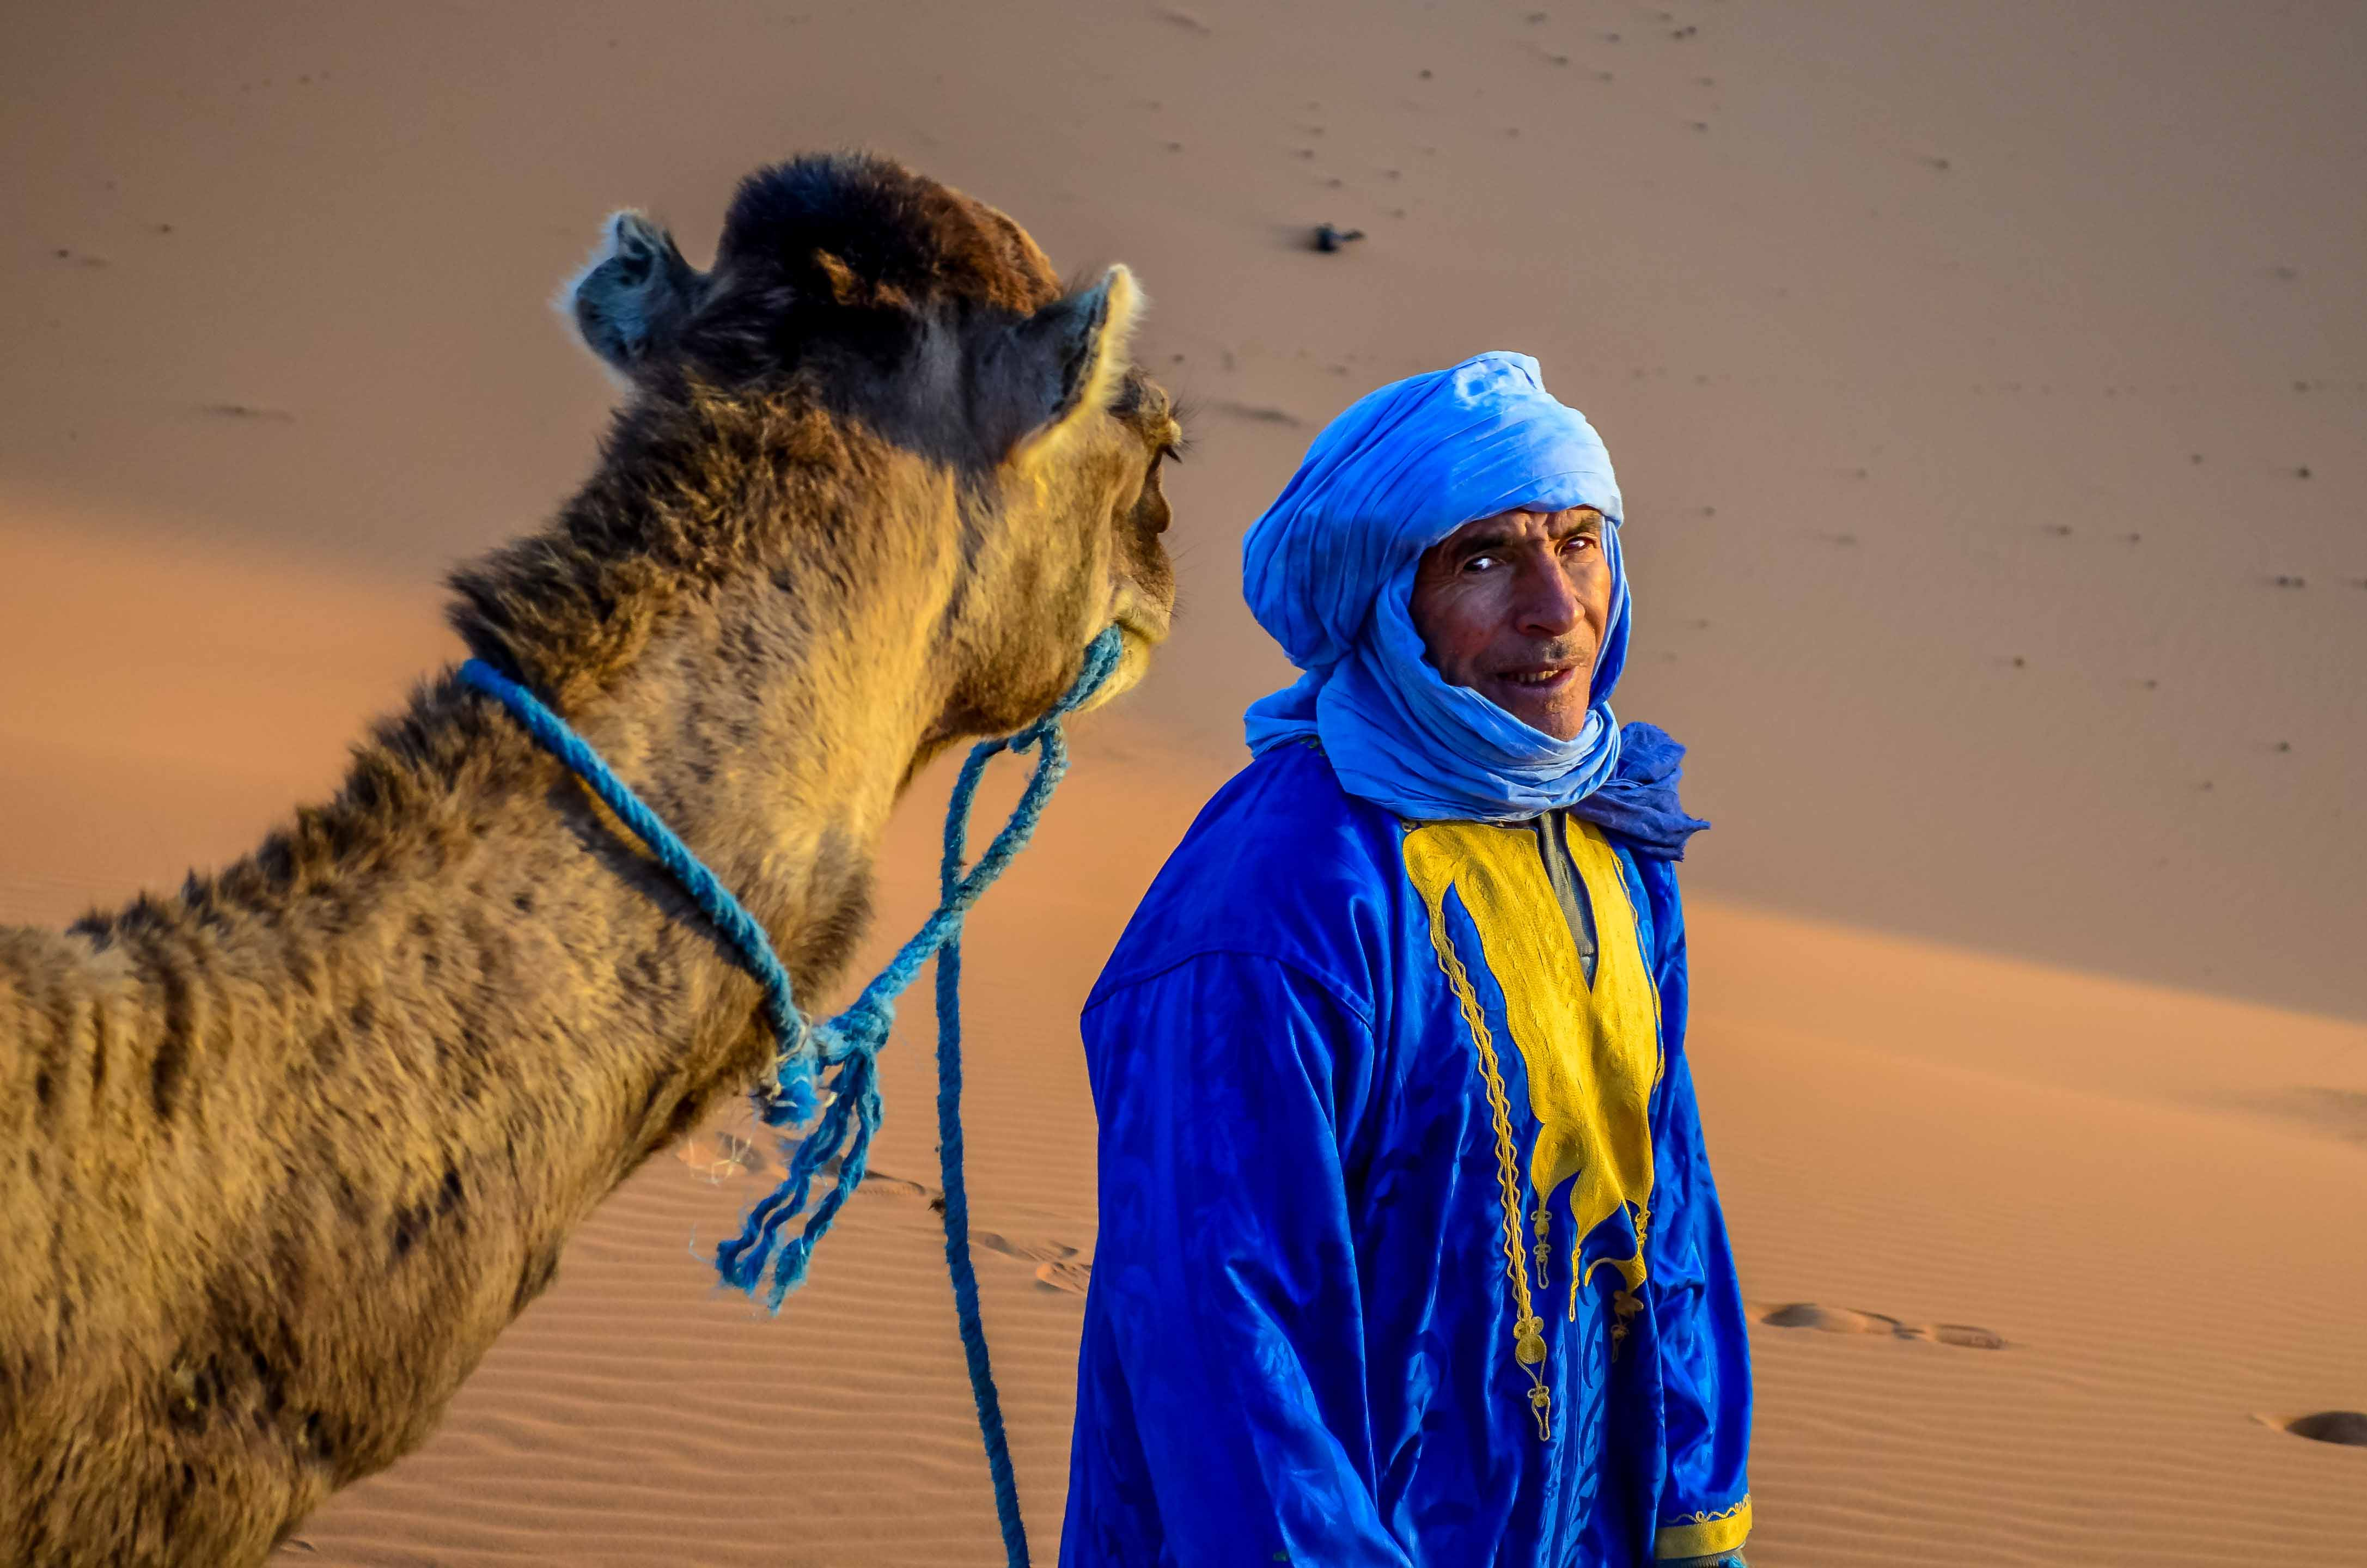 Mergouza Maroc Sahara desertsahara voyage blog blogvoyage desert icietlabas berbere